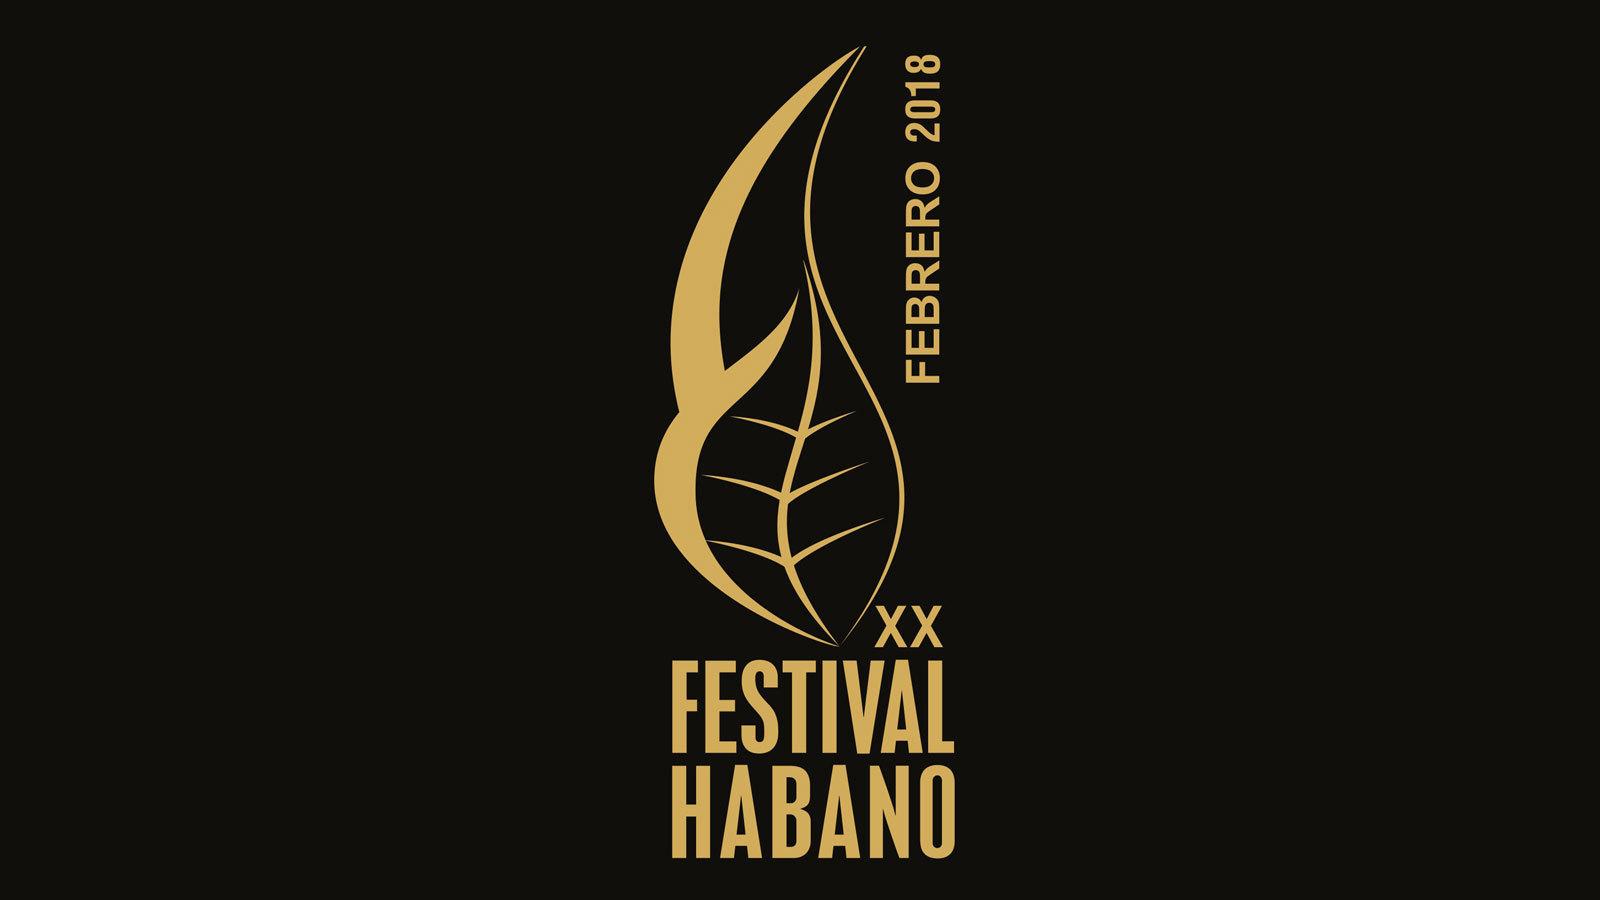 habanos-2018-1600.jpg